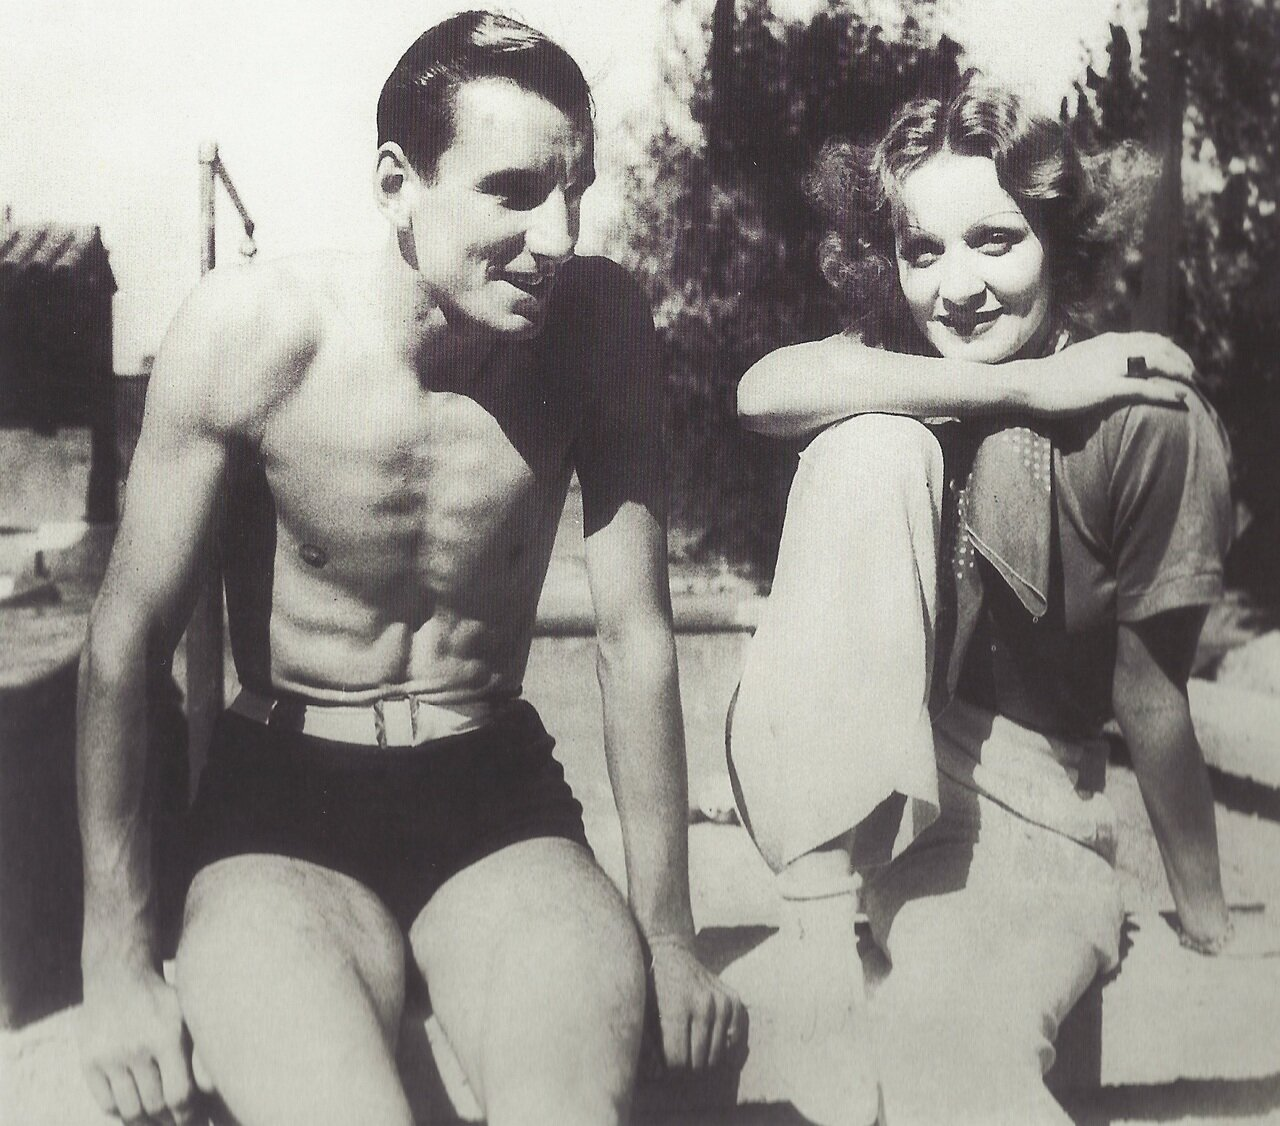 1930. Теннисист Фред Перри с Марлен Дитрих, Голливуд